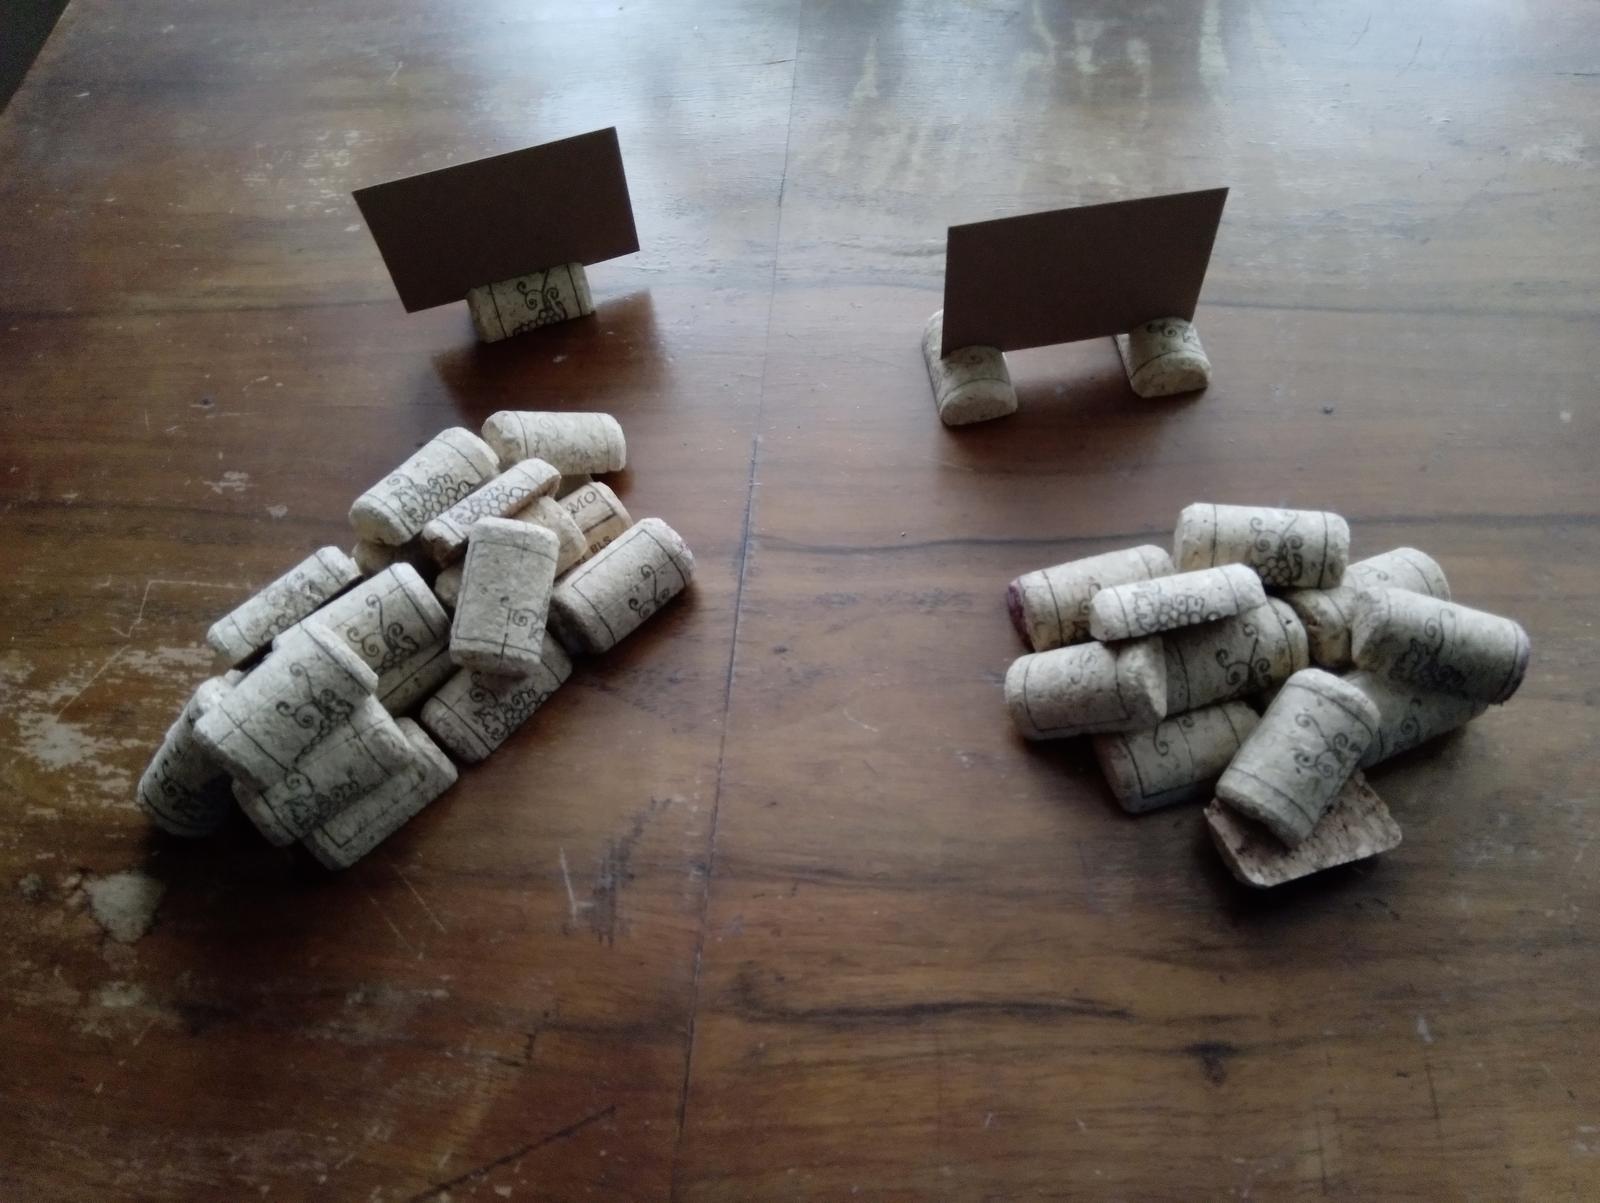 Korkové stojánky na jmenovky/cedulky - Obrázek č. 1